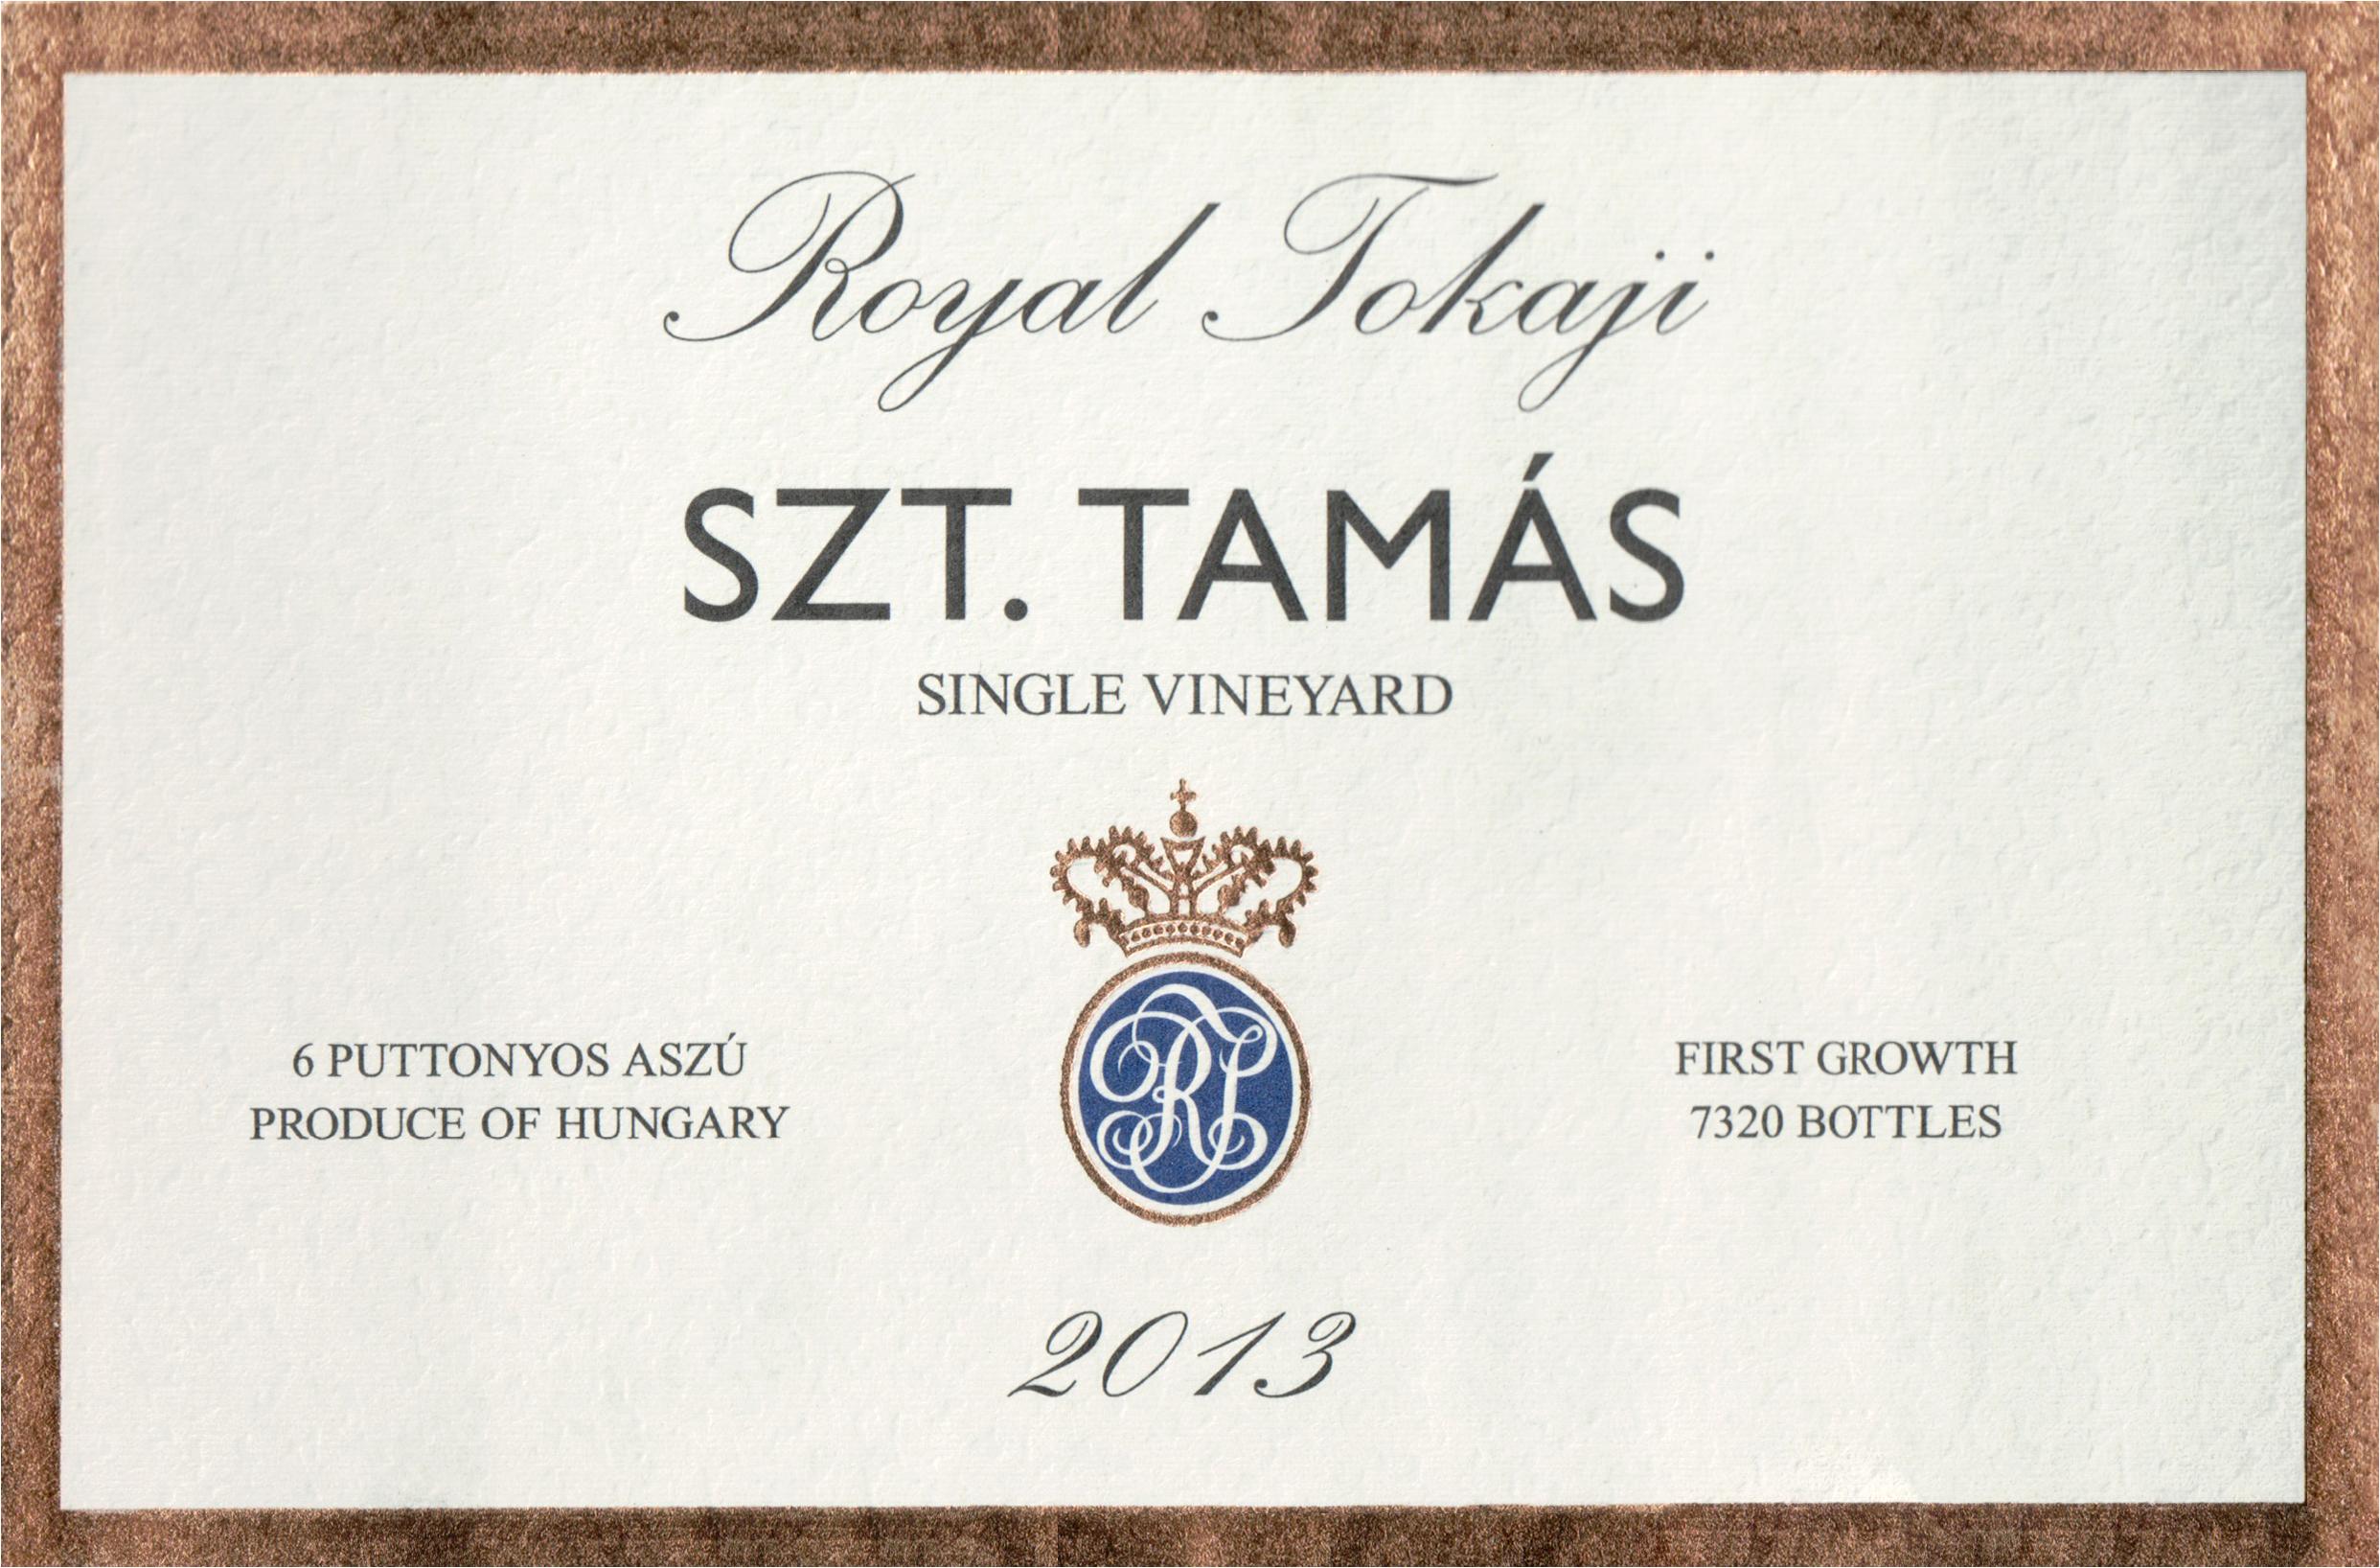 Royal Tokaji Szt. Tamas Single Vineyard 6 Puttonyos Aszu 2013